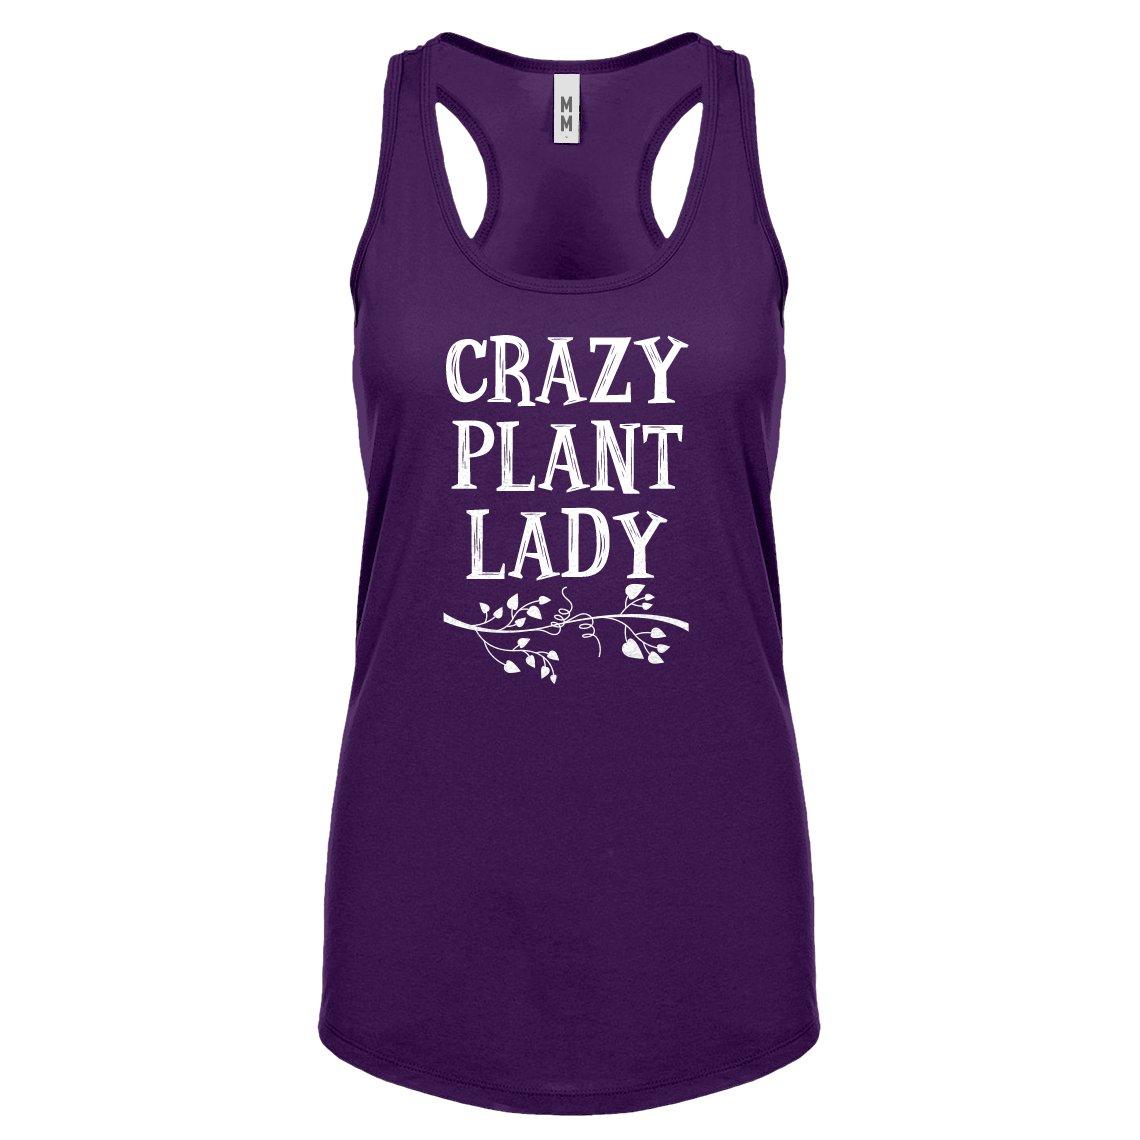 Crazy Plant Lady Racerback Tank Top 1797 Shirts